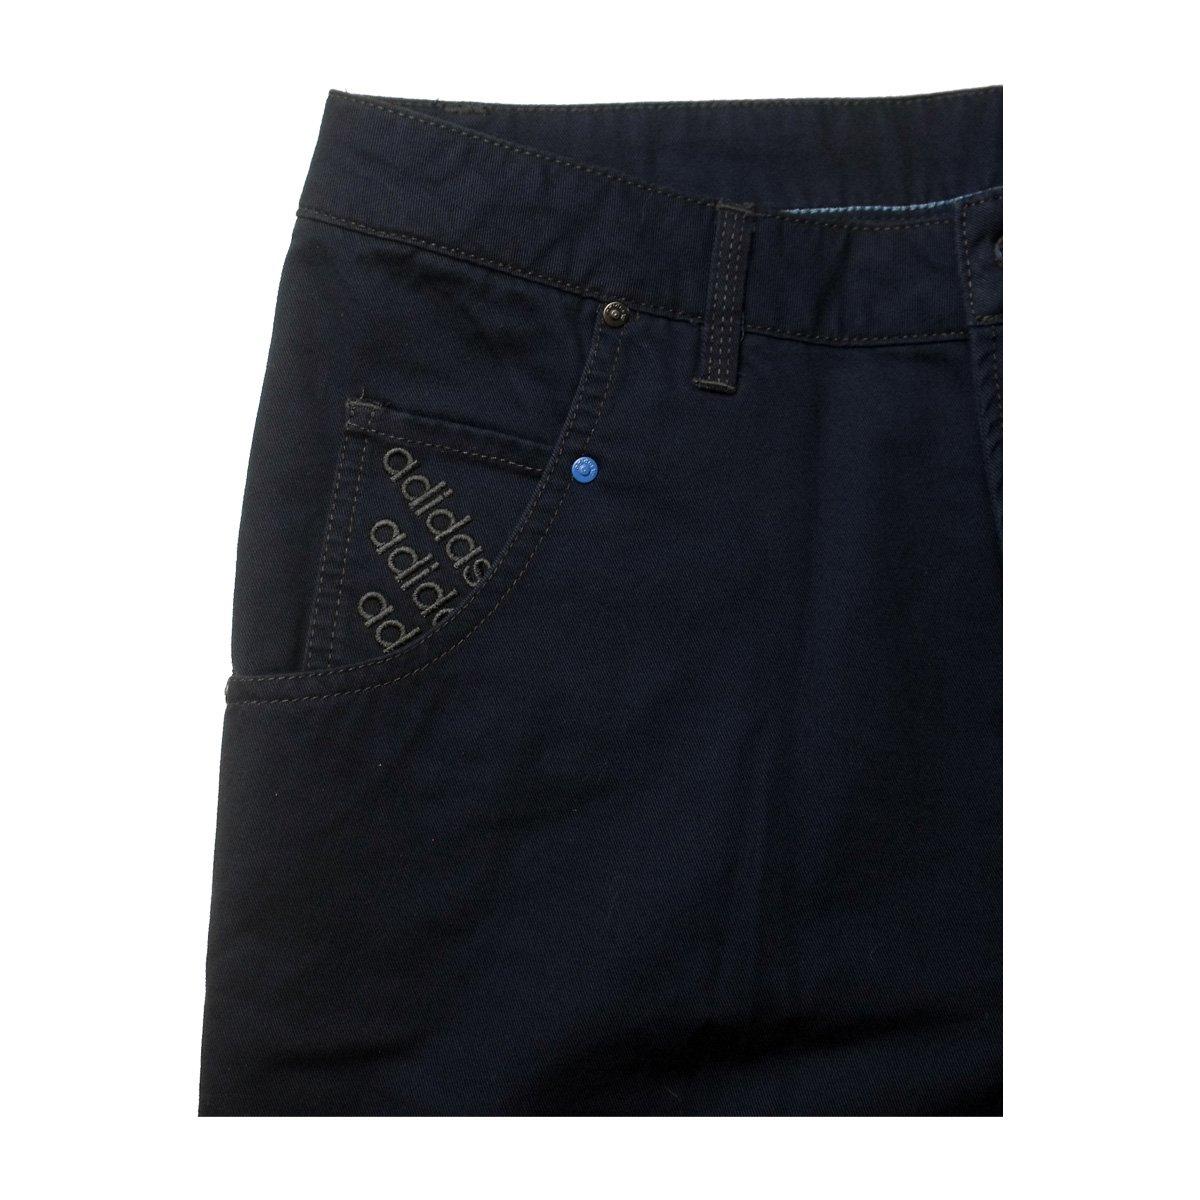 Adidas para hombre pantalones vaqueros Original Chill Pant ...